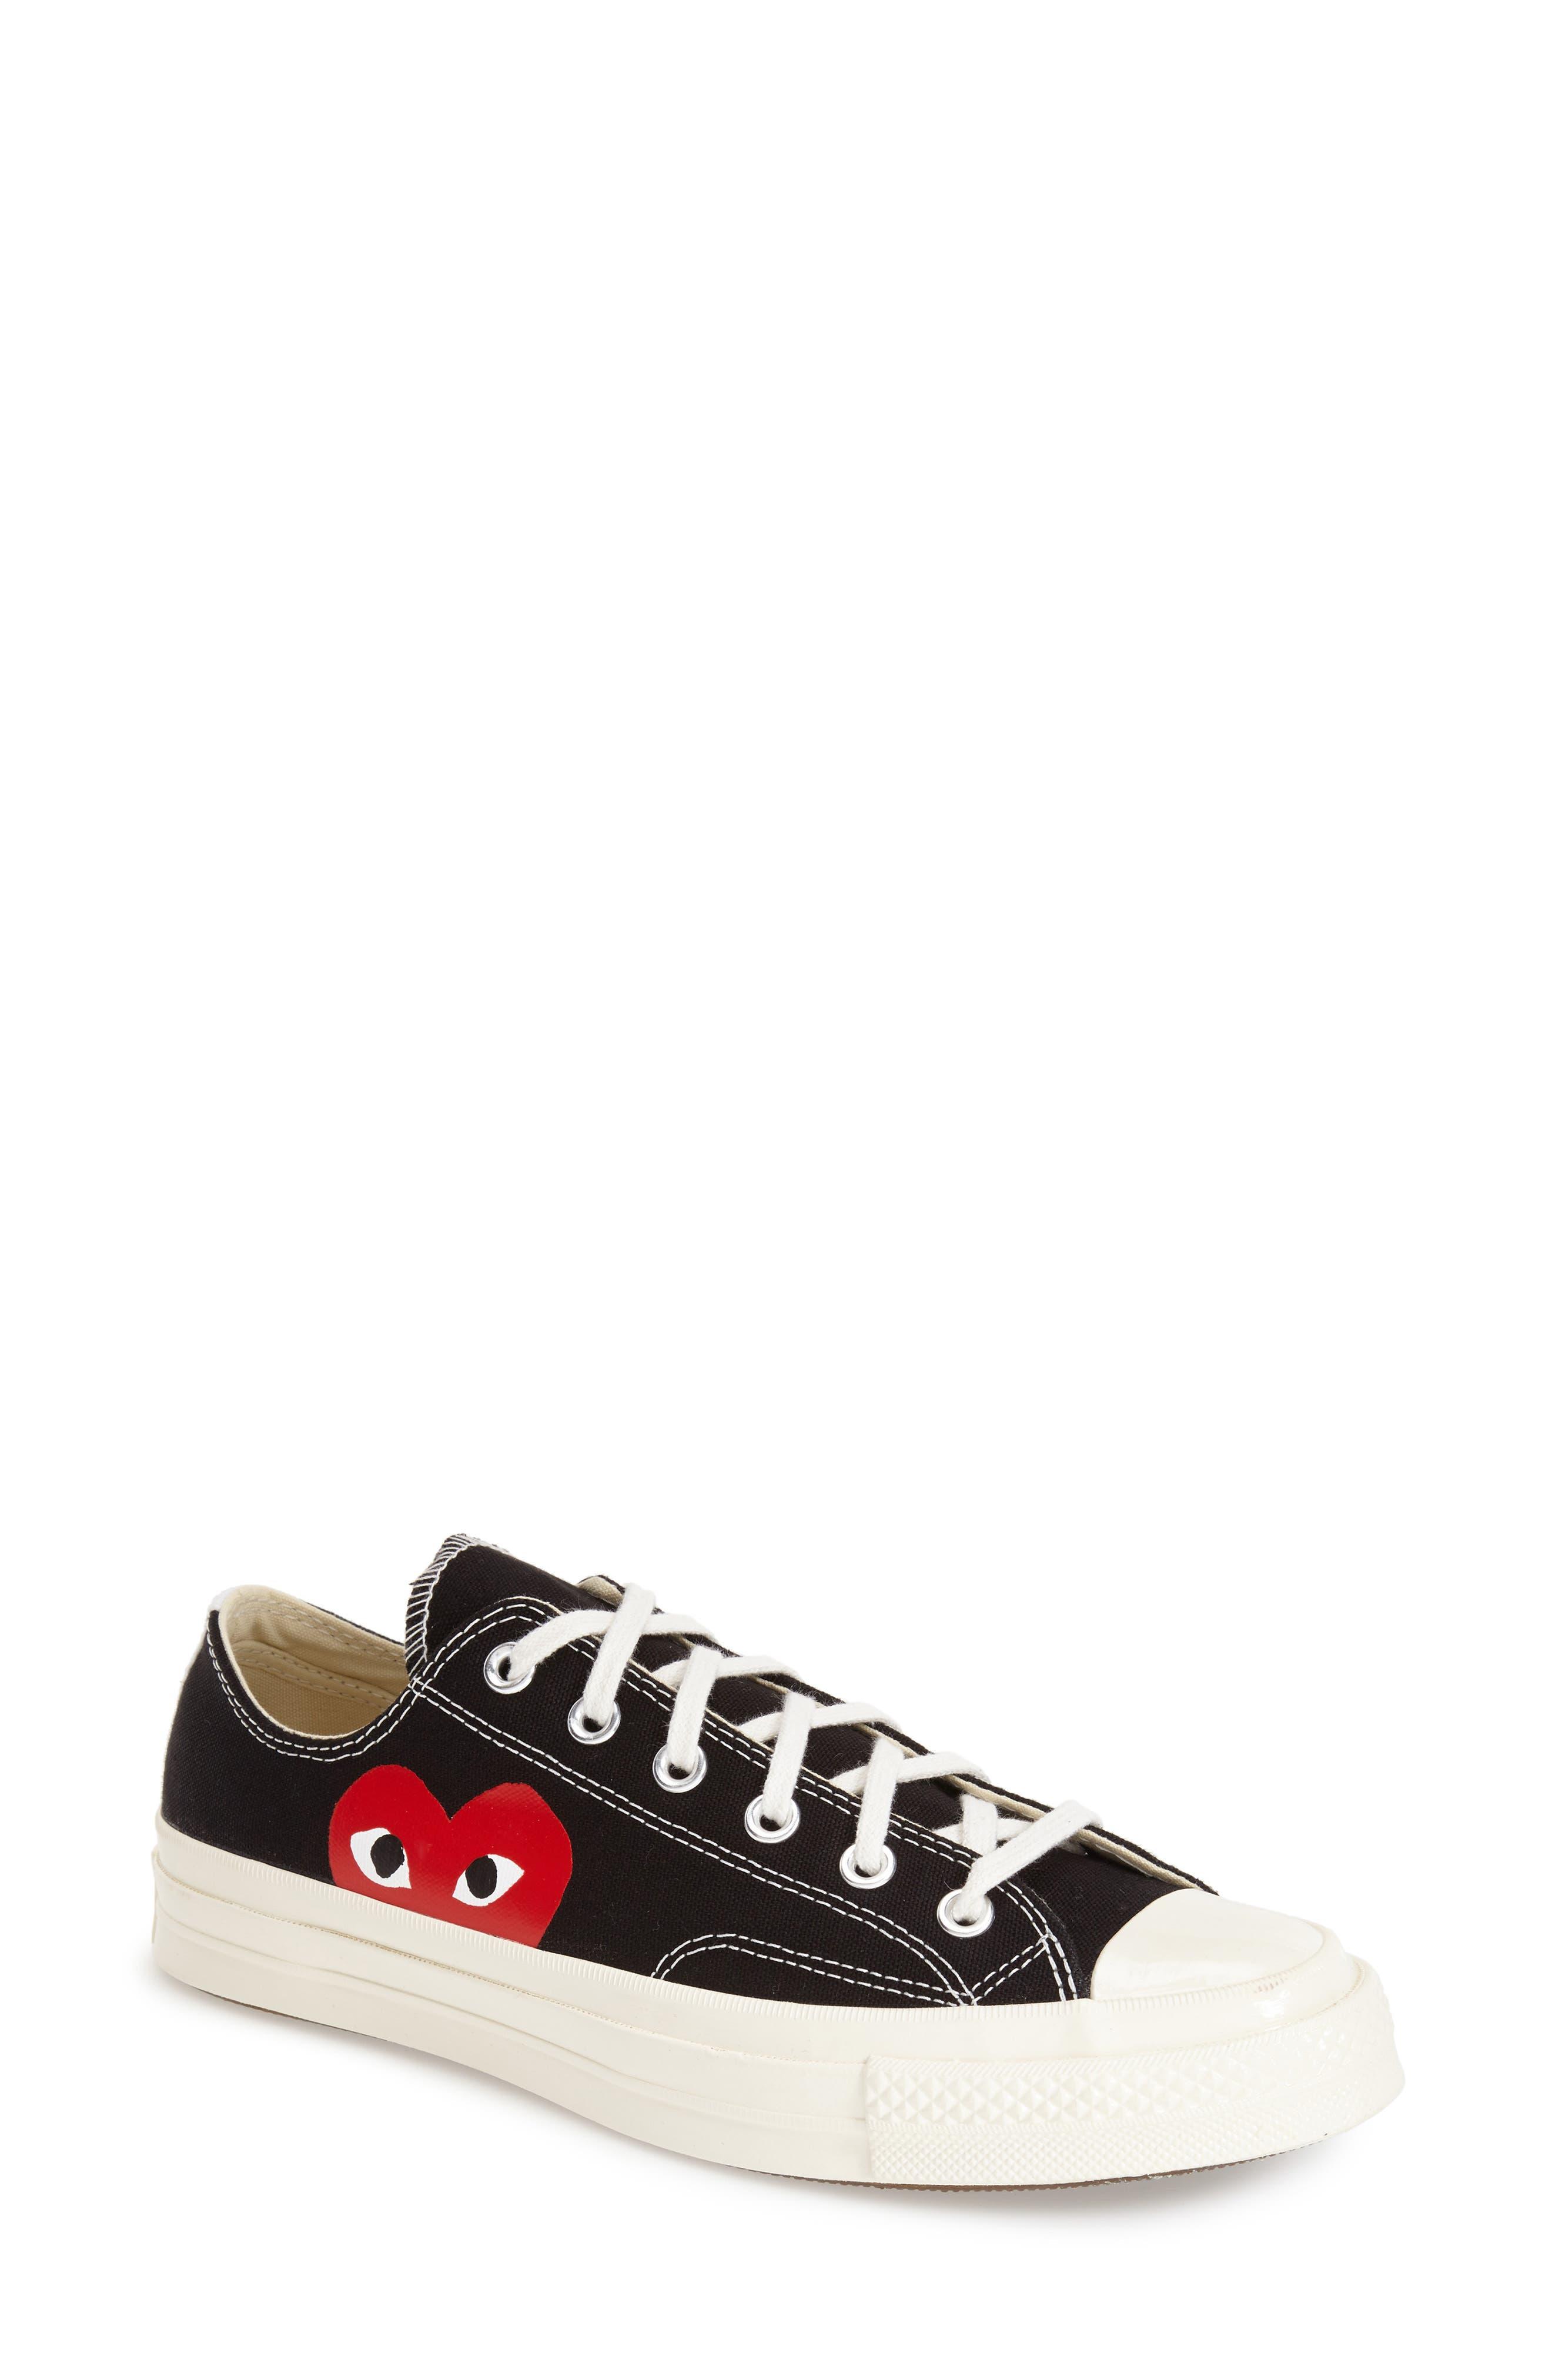 COMME DES GARÇONS PLAY, x Converse Chuck Taylor<sup>®</sup> Hidden Heart Low Top Sneaker, Alternate thumbnail 4, color, BLACK